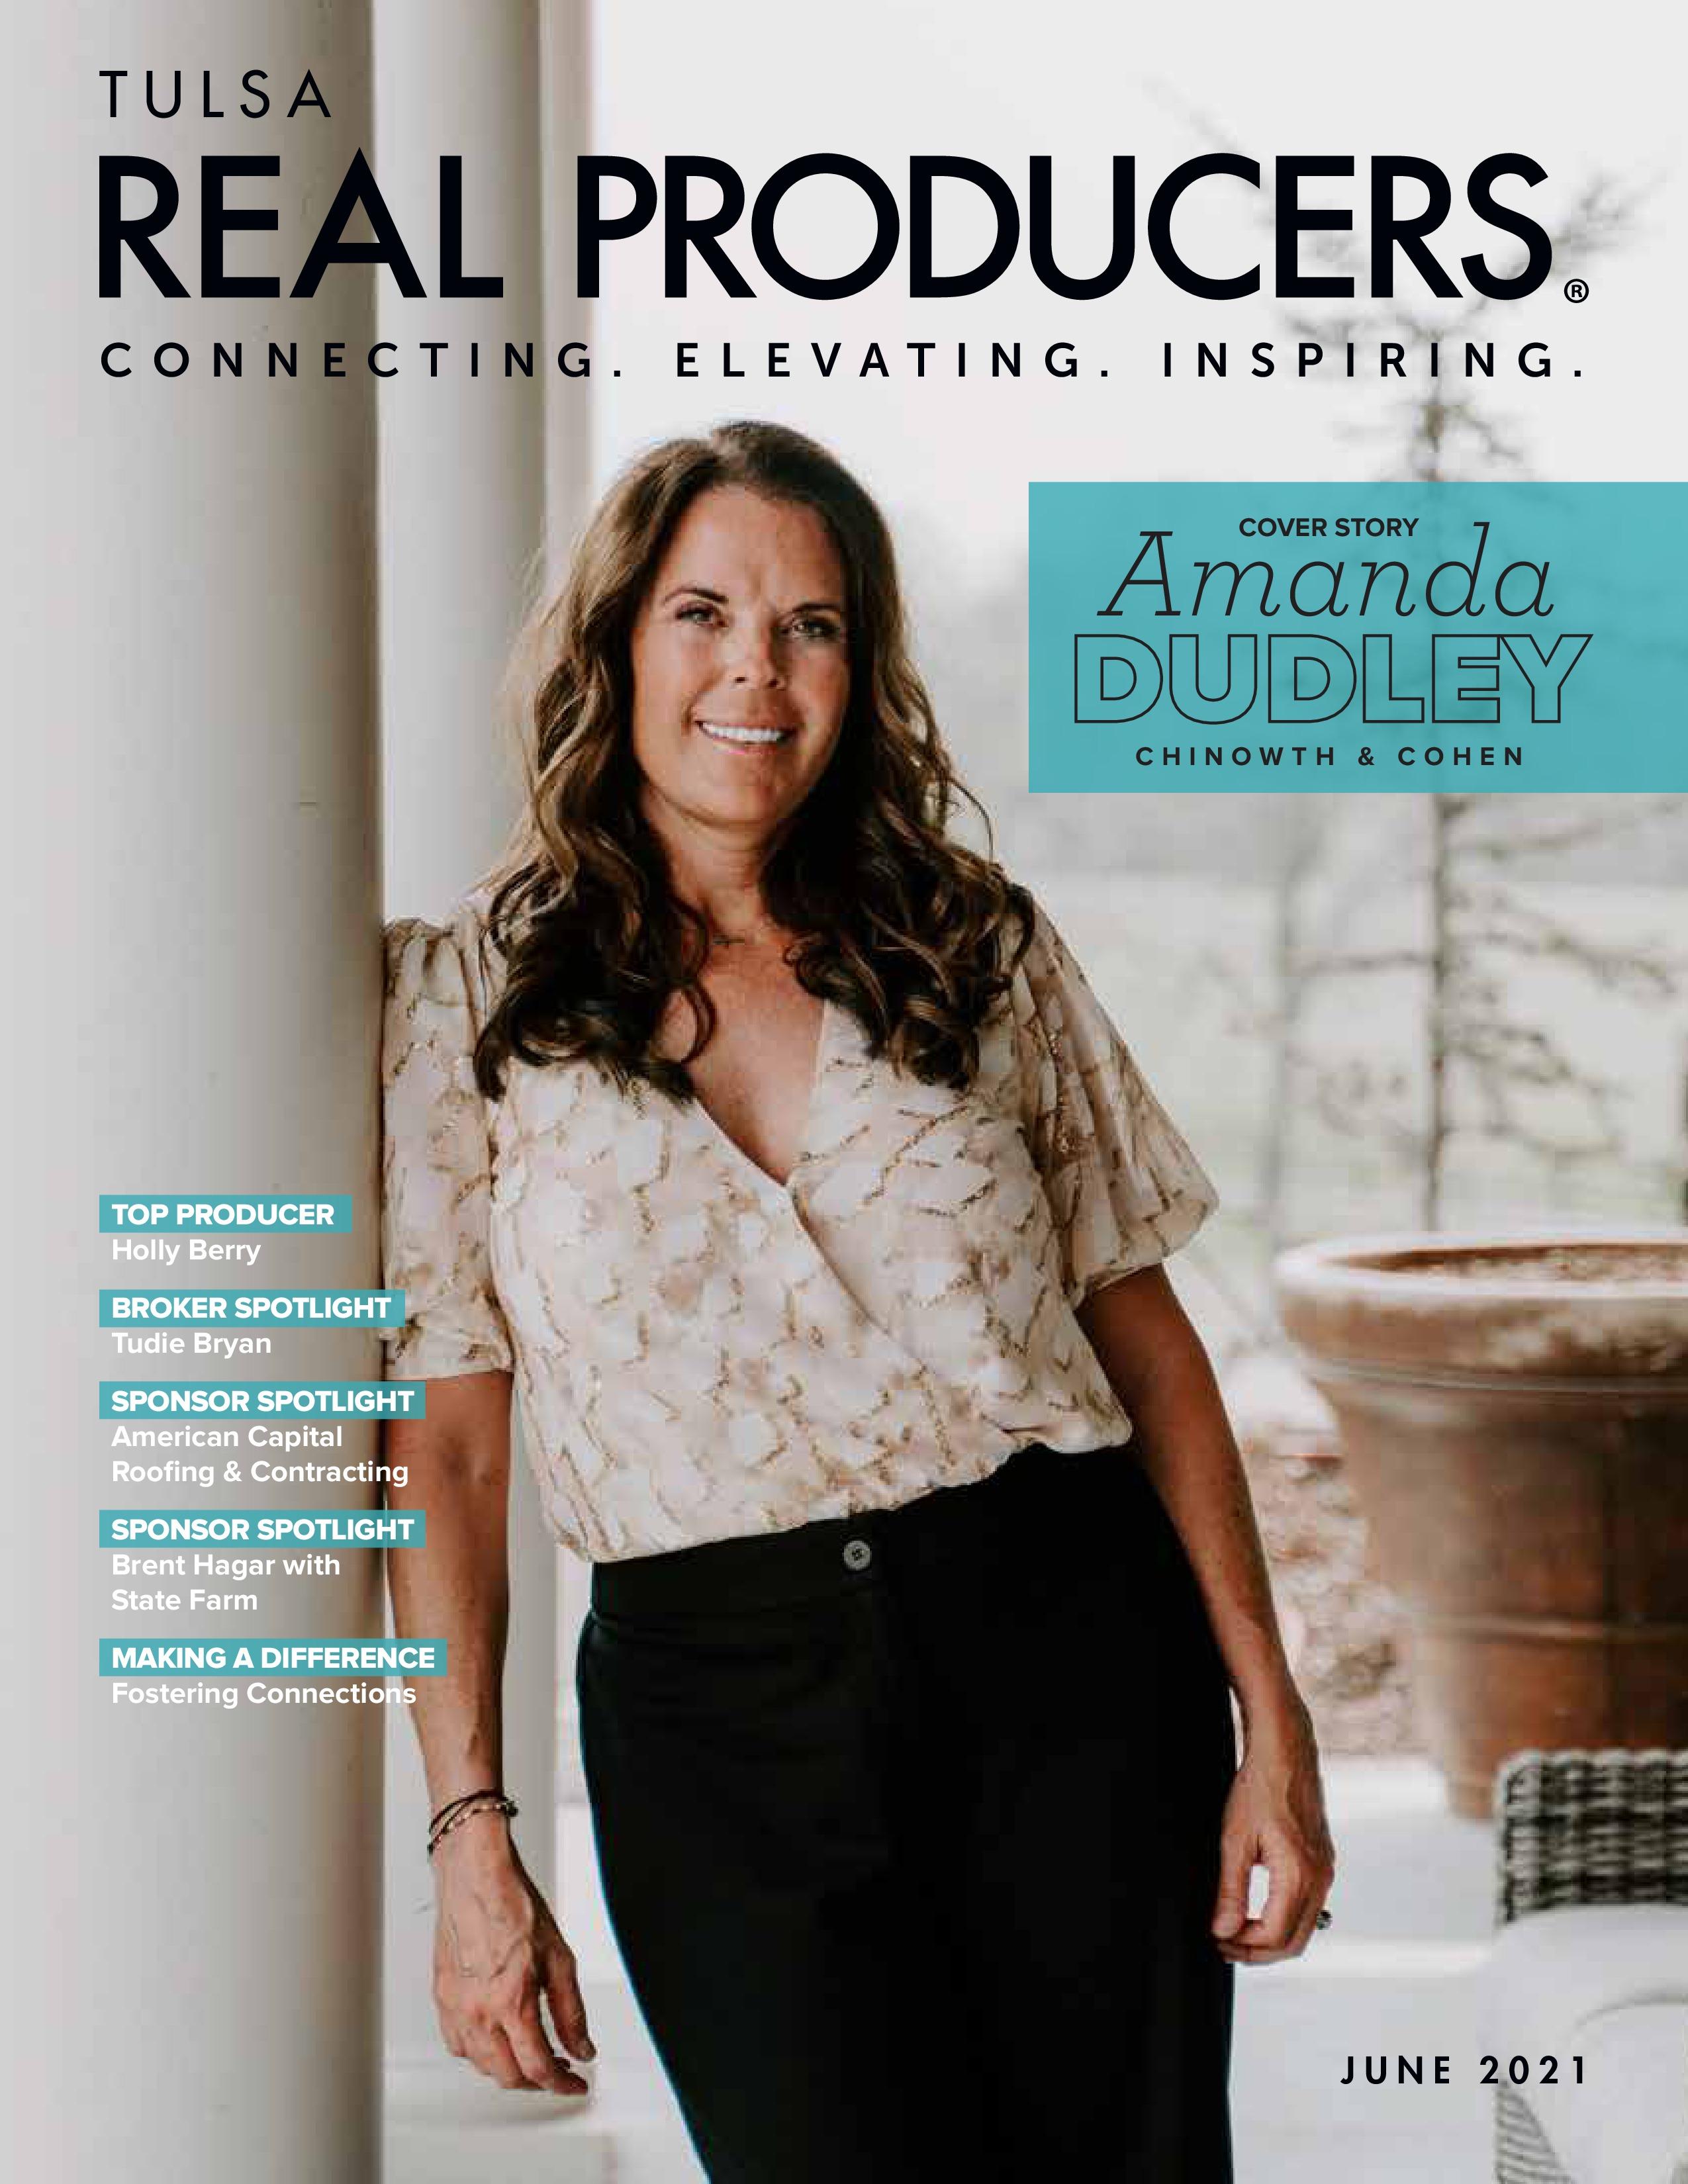 Tulsa Real Producers 2021-06-01